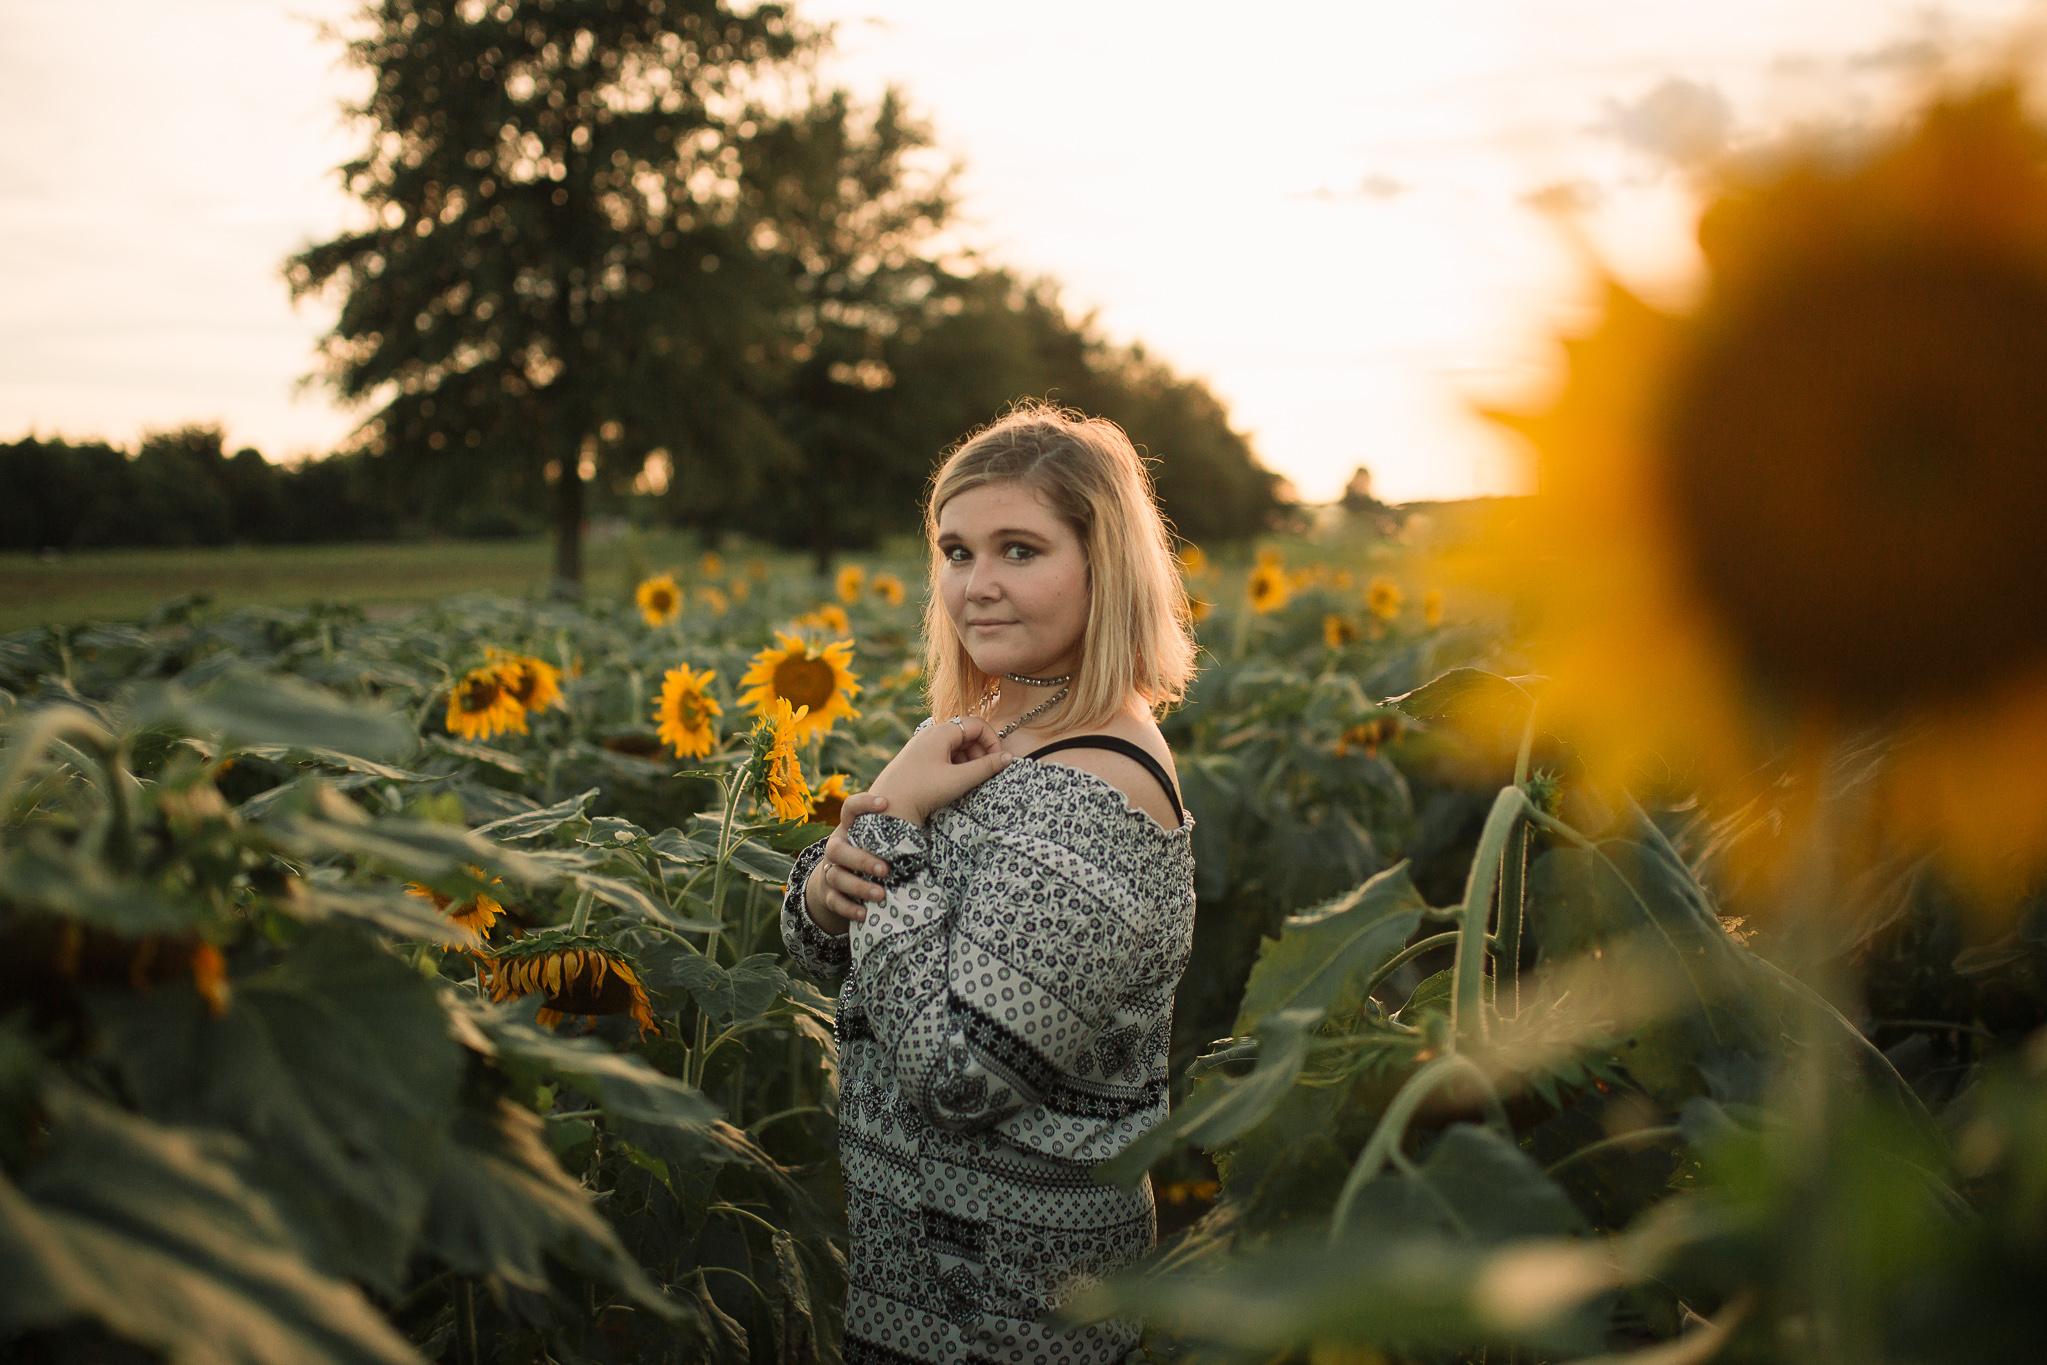 memphis-senior-photographer-senior-pictures-sunflower-field